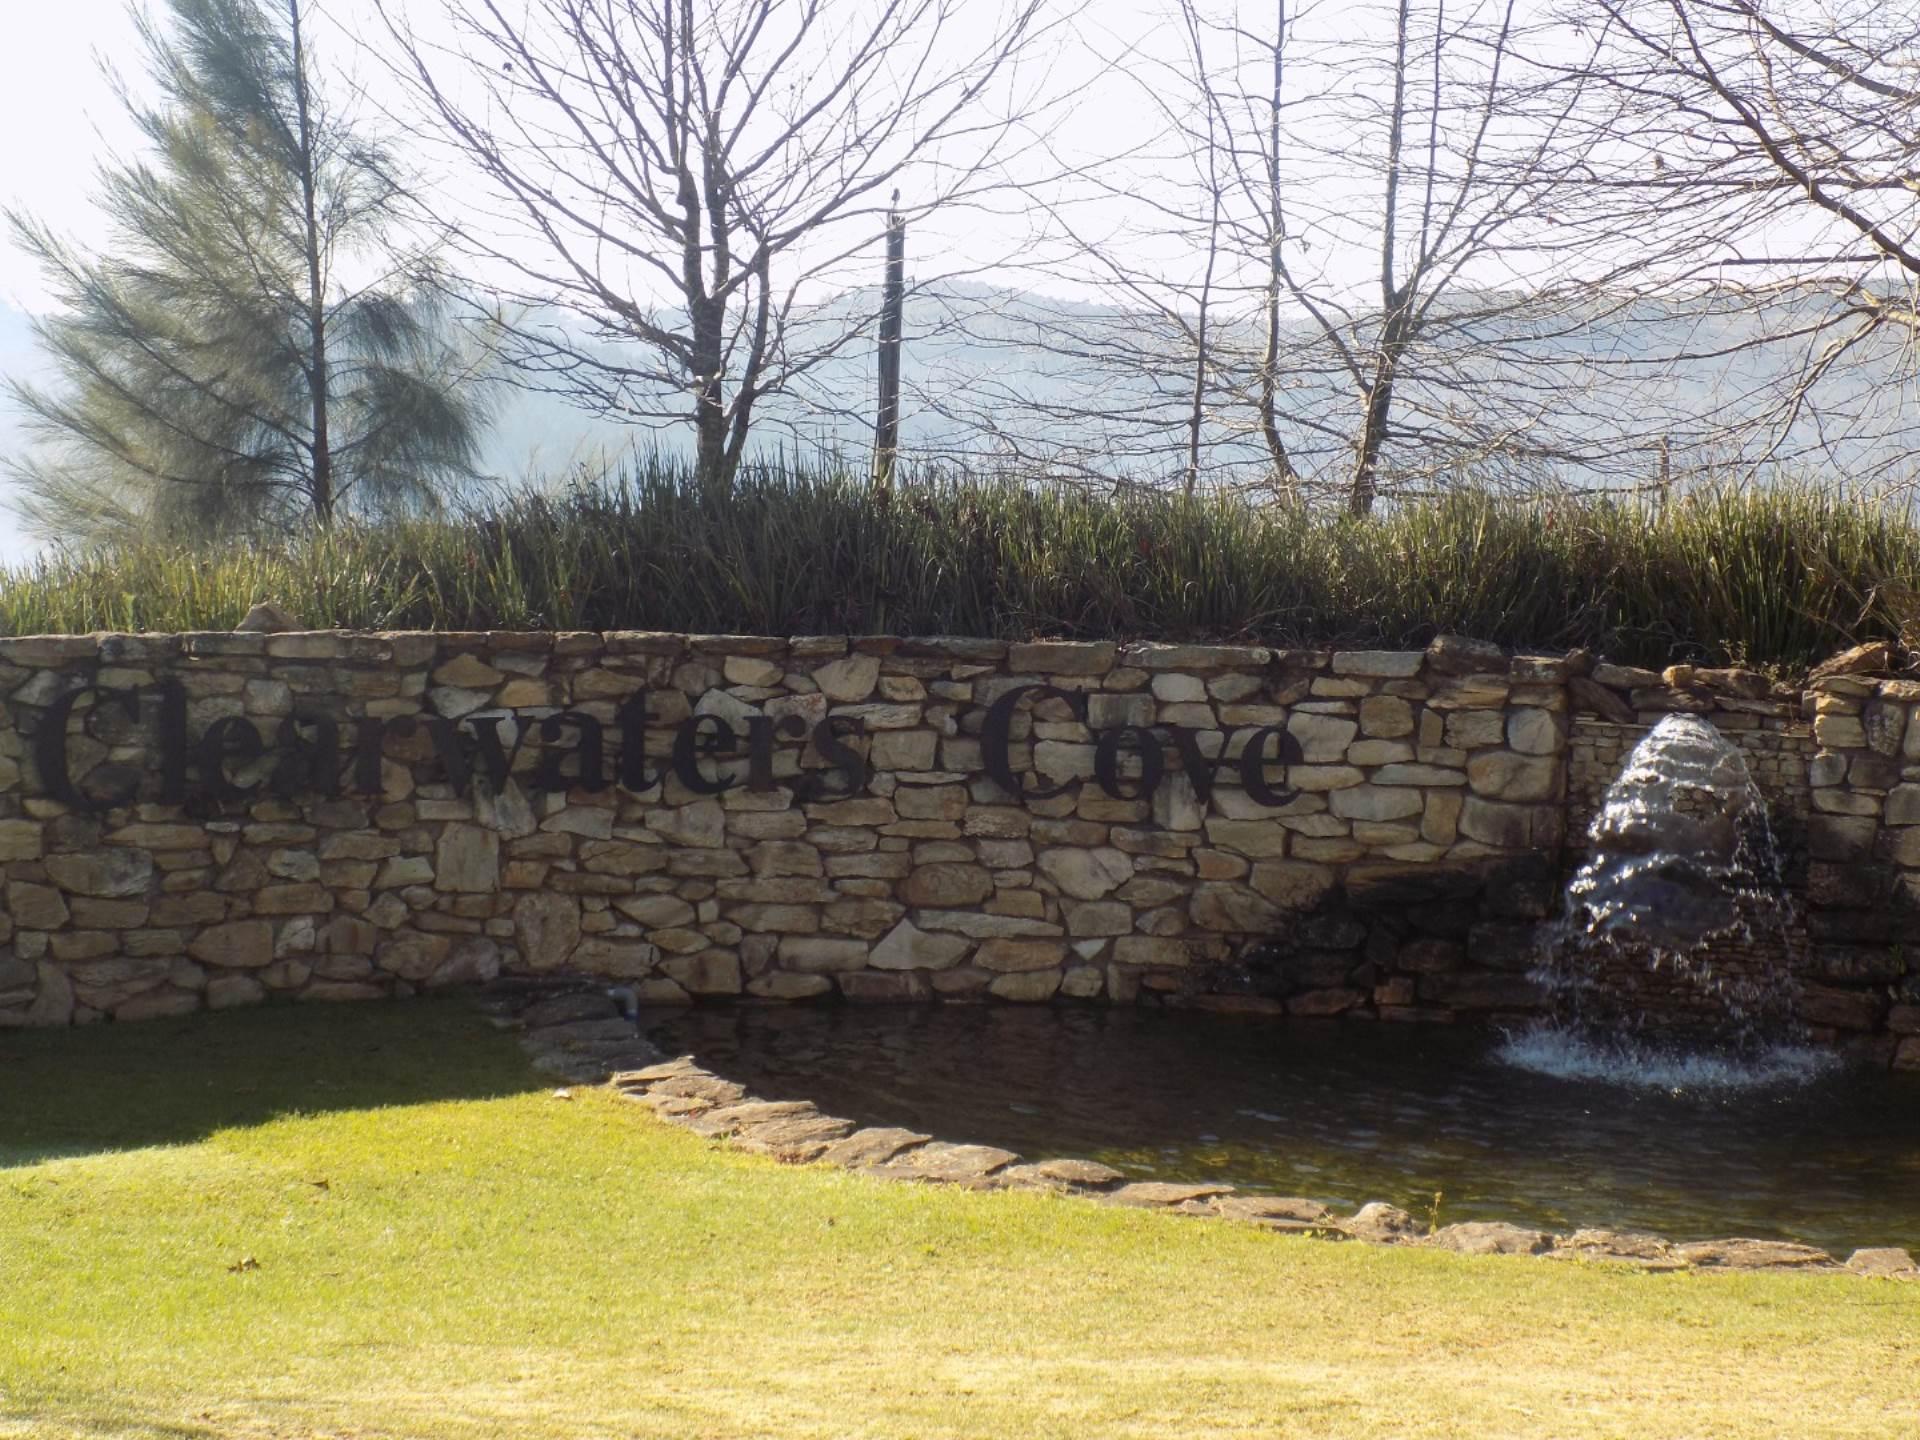 Vacant Land Residential For Sale In Haenertsburg